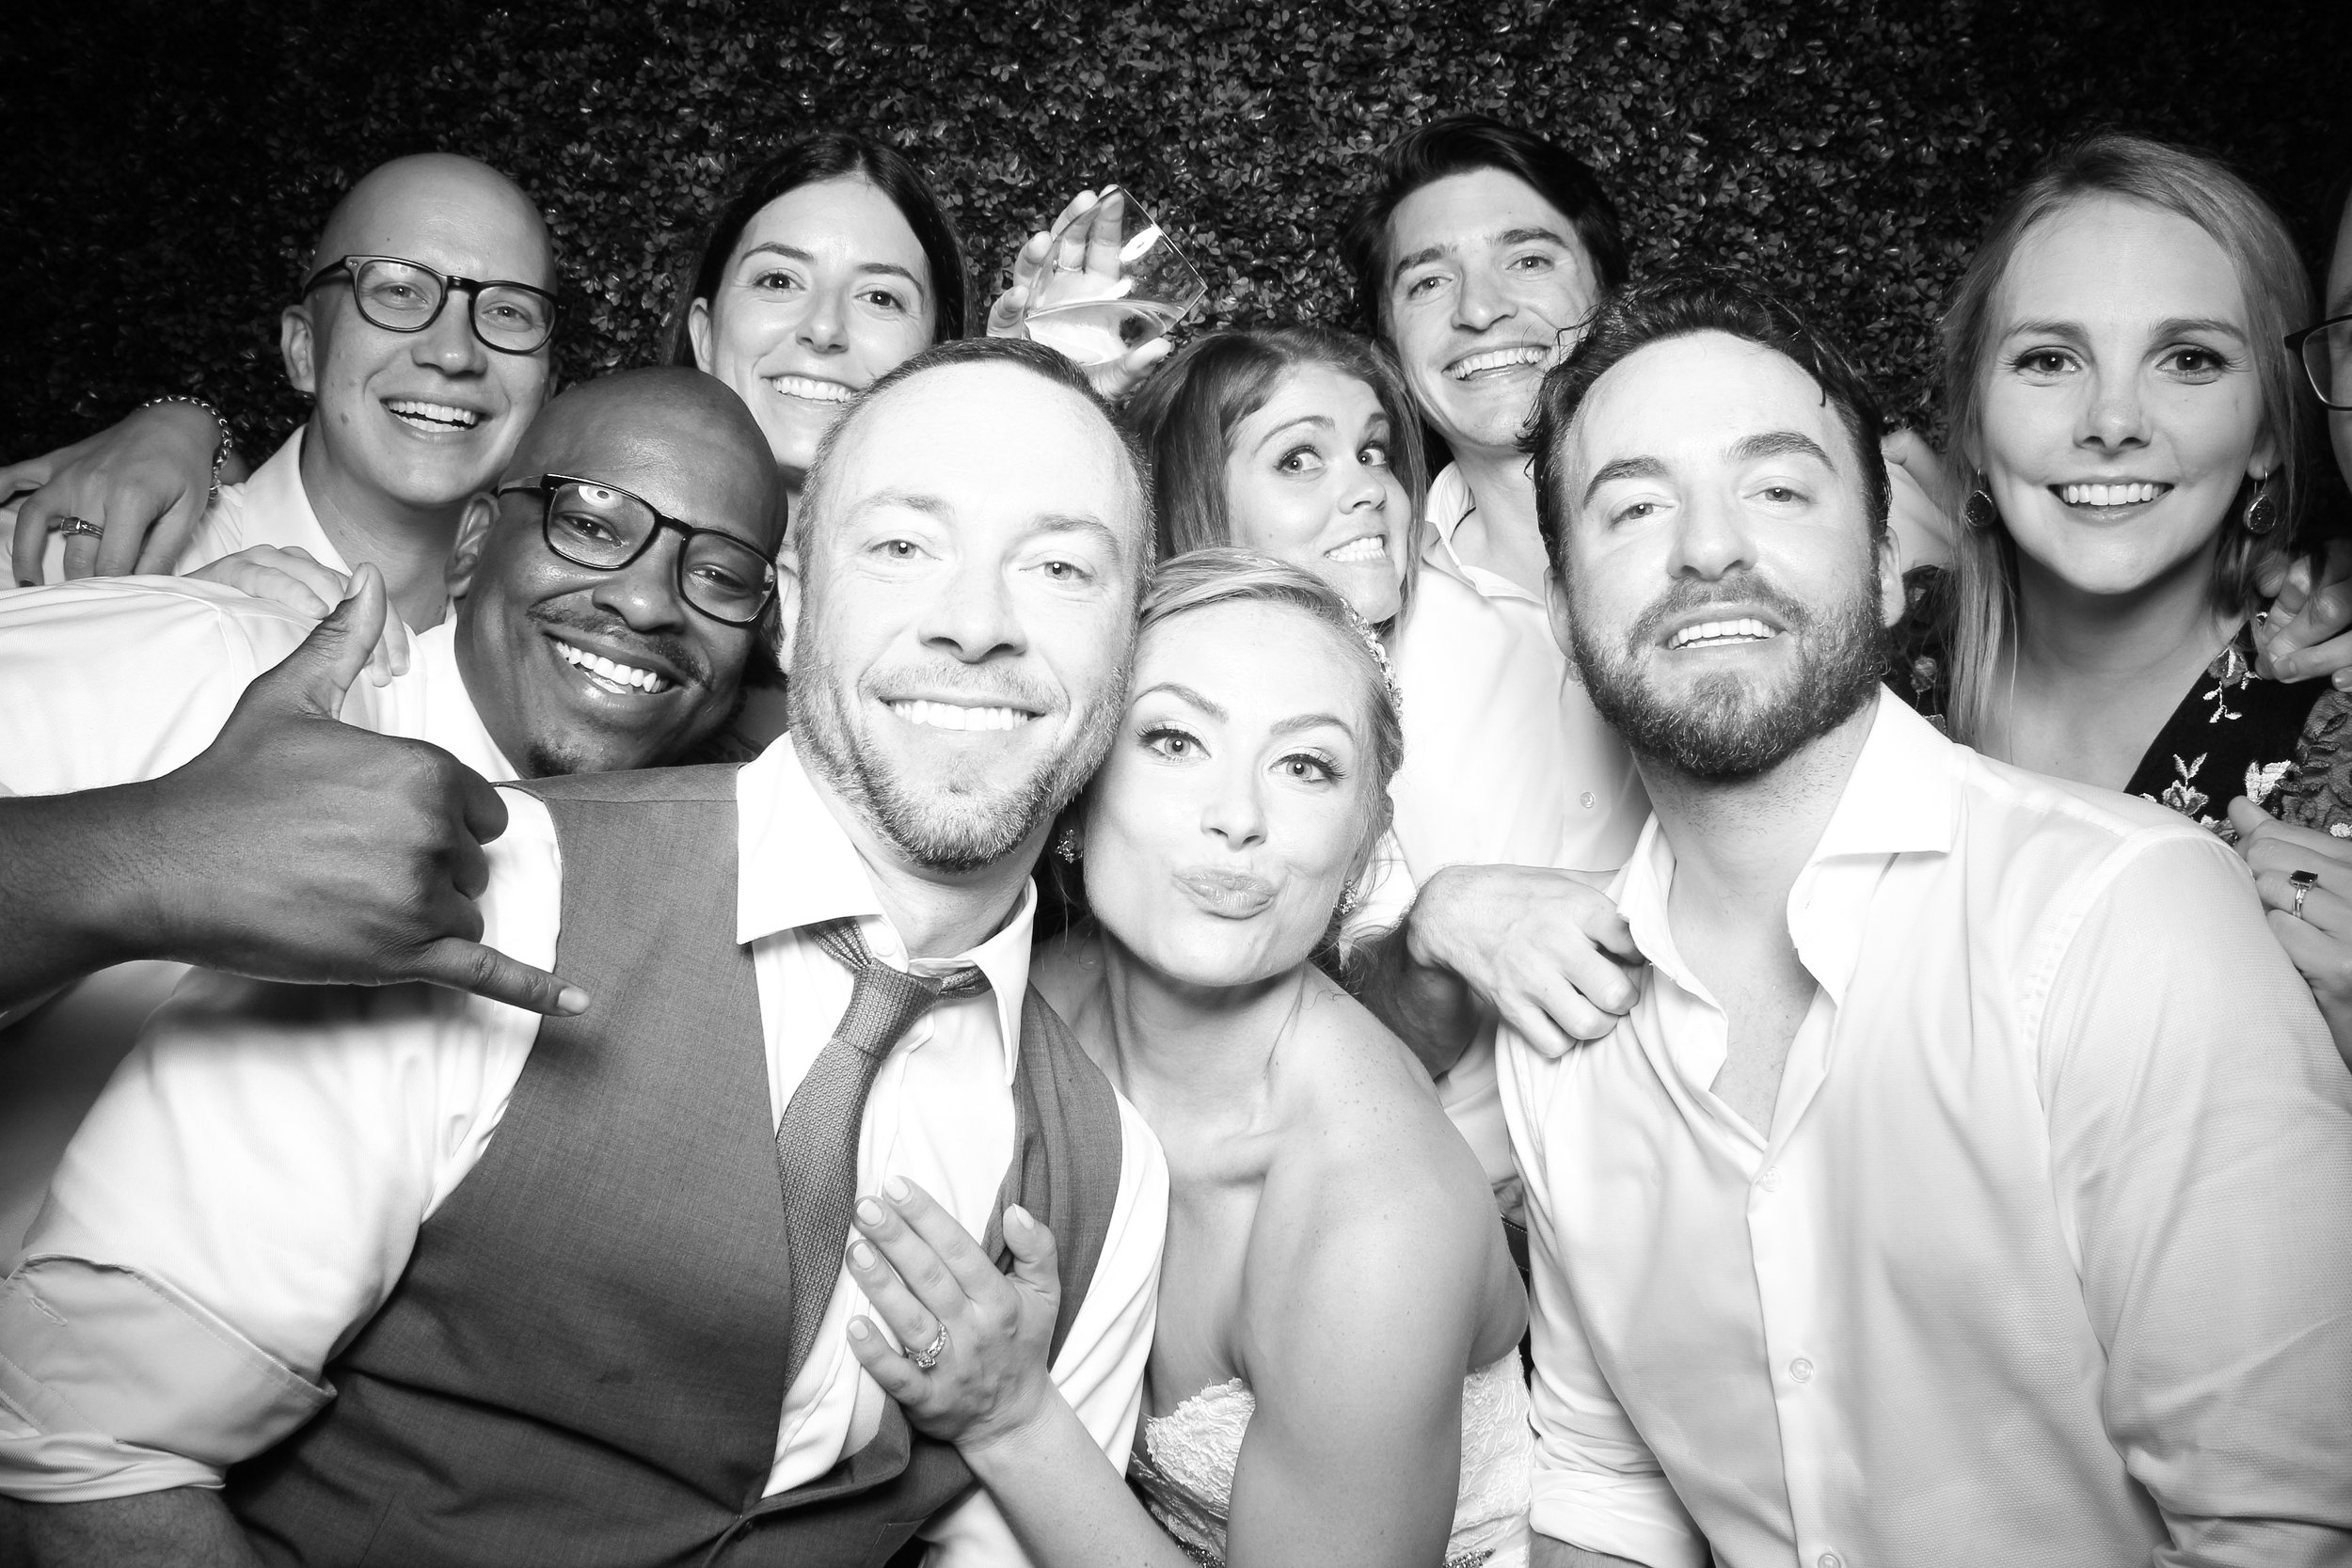 Ignite_Glass_Studio_Wedding_Photo_Booth_Boxwood_Chicago_23.jpg